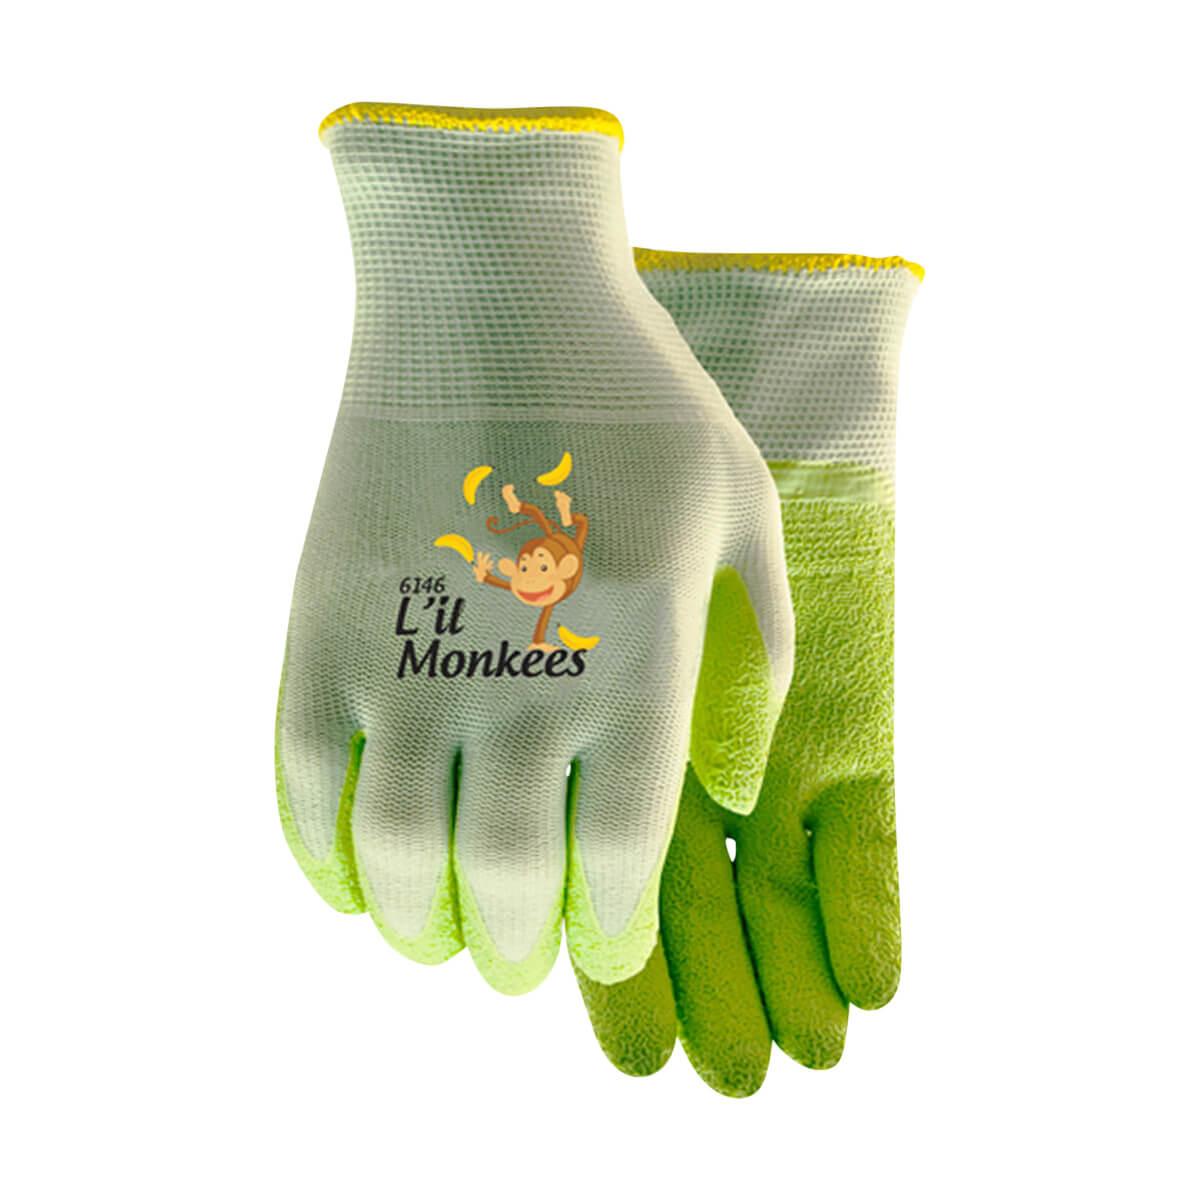 L'il Monkees Gloves